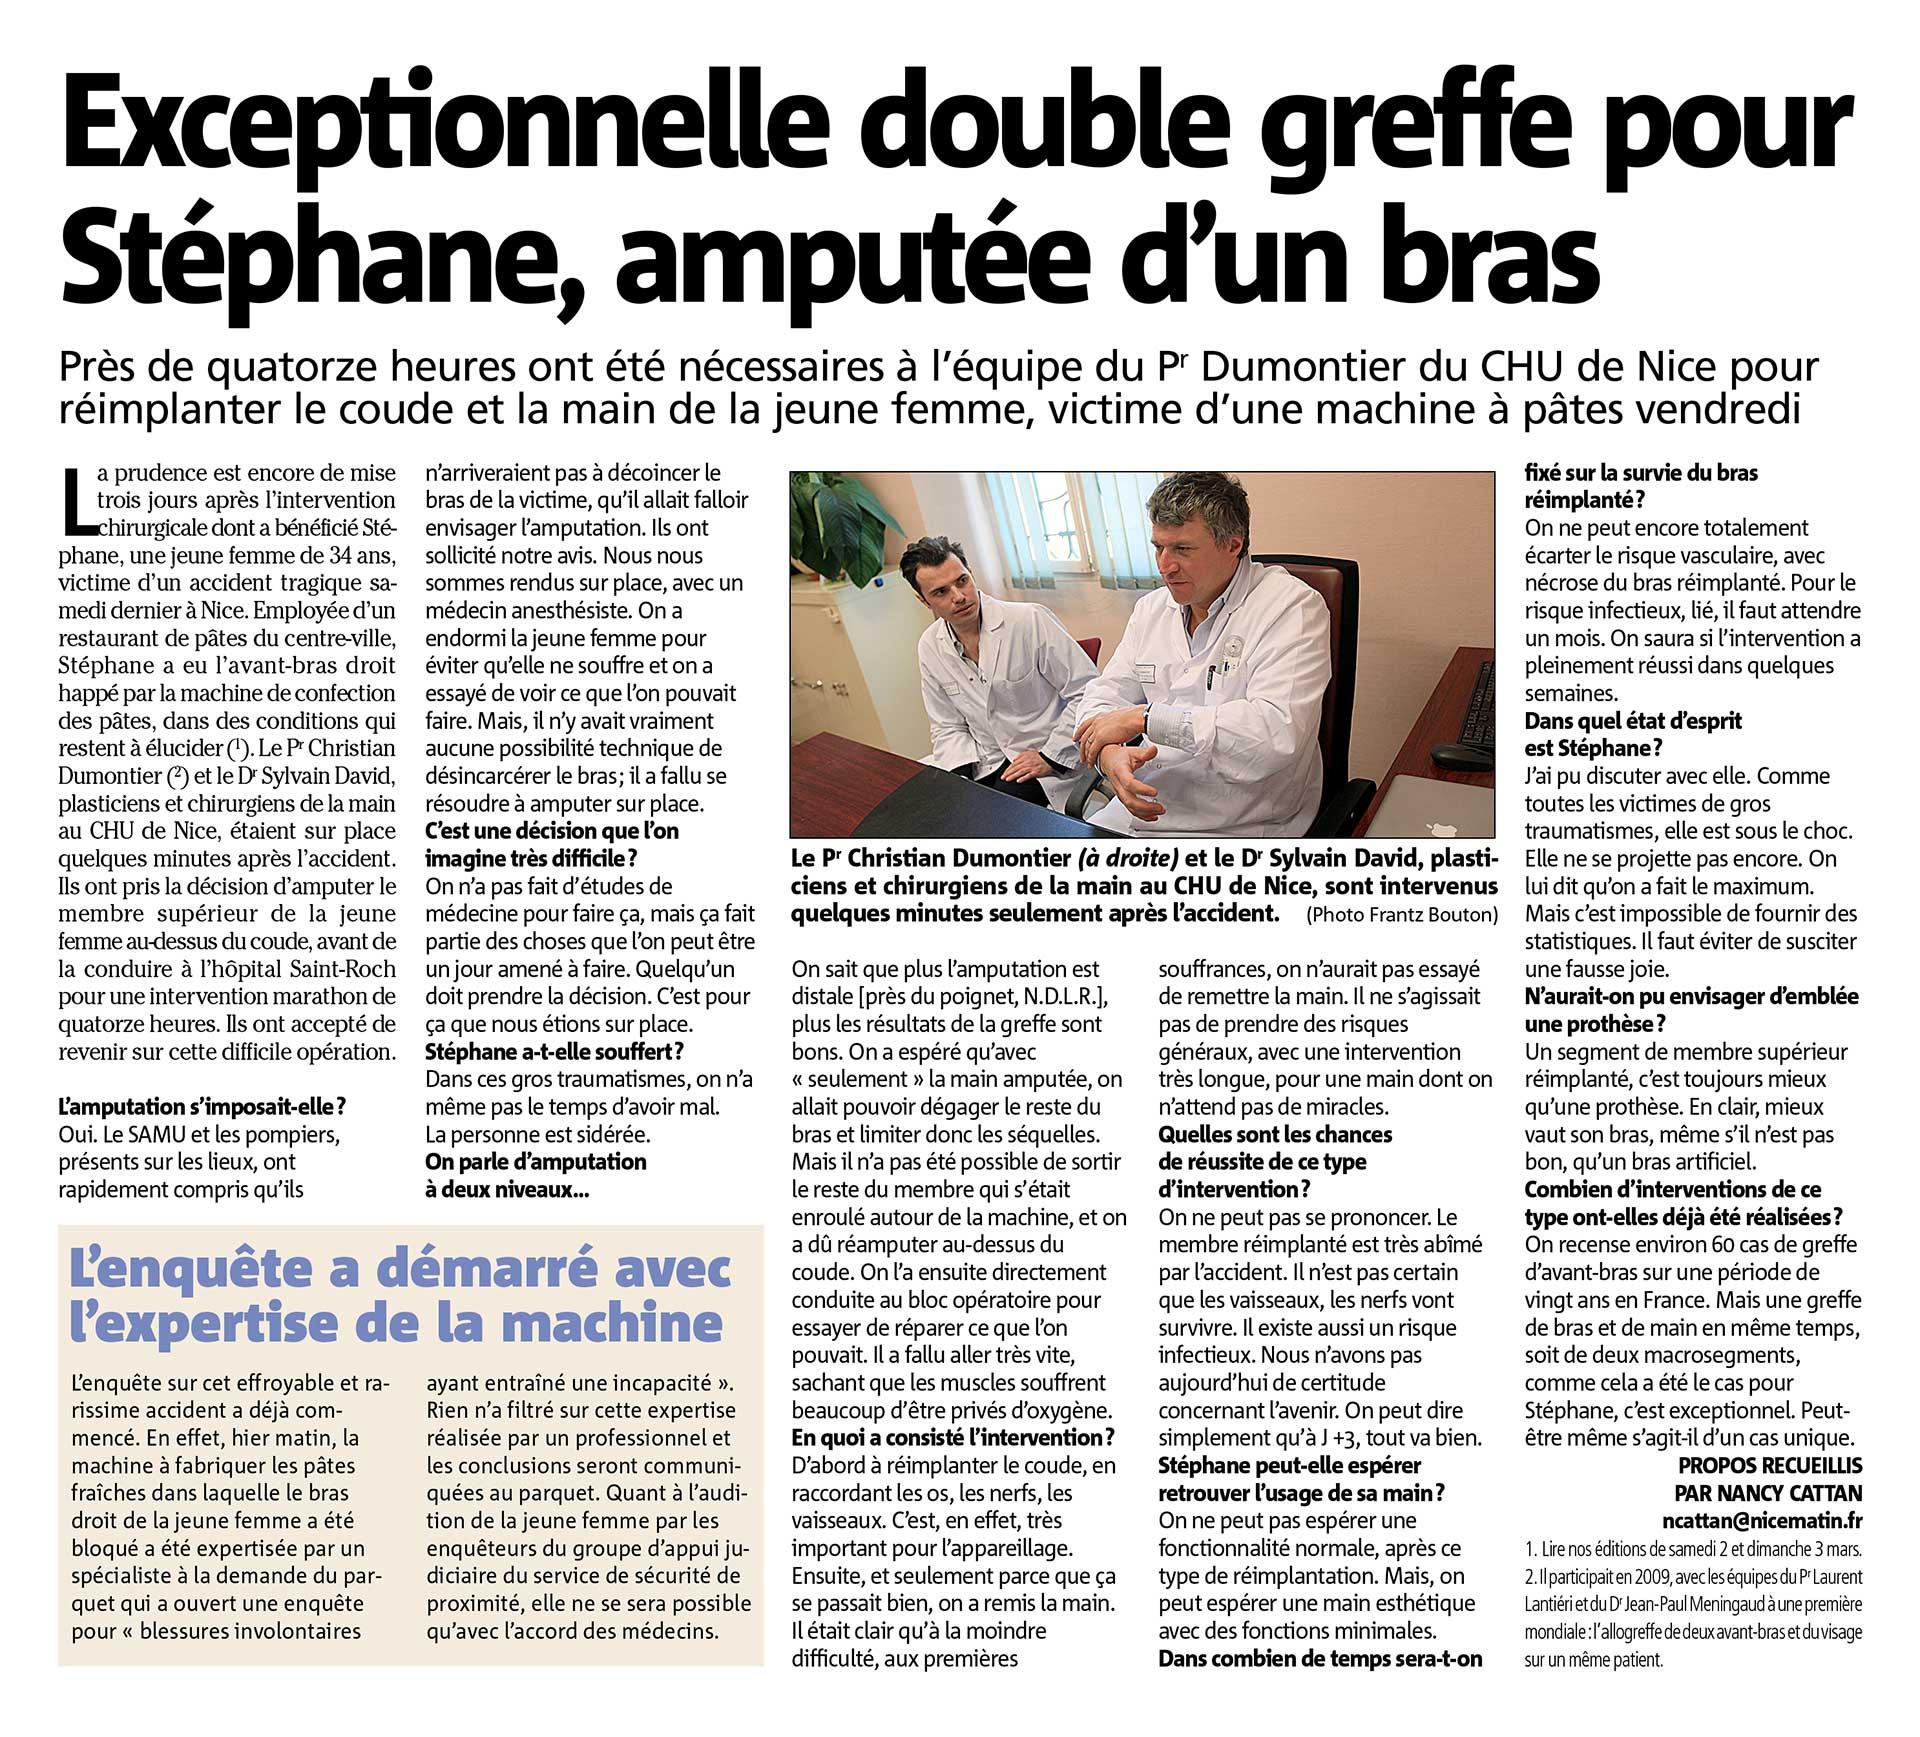 opération double greffe Nicematin